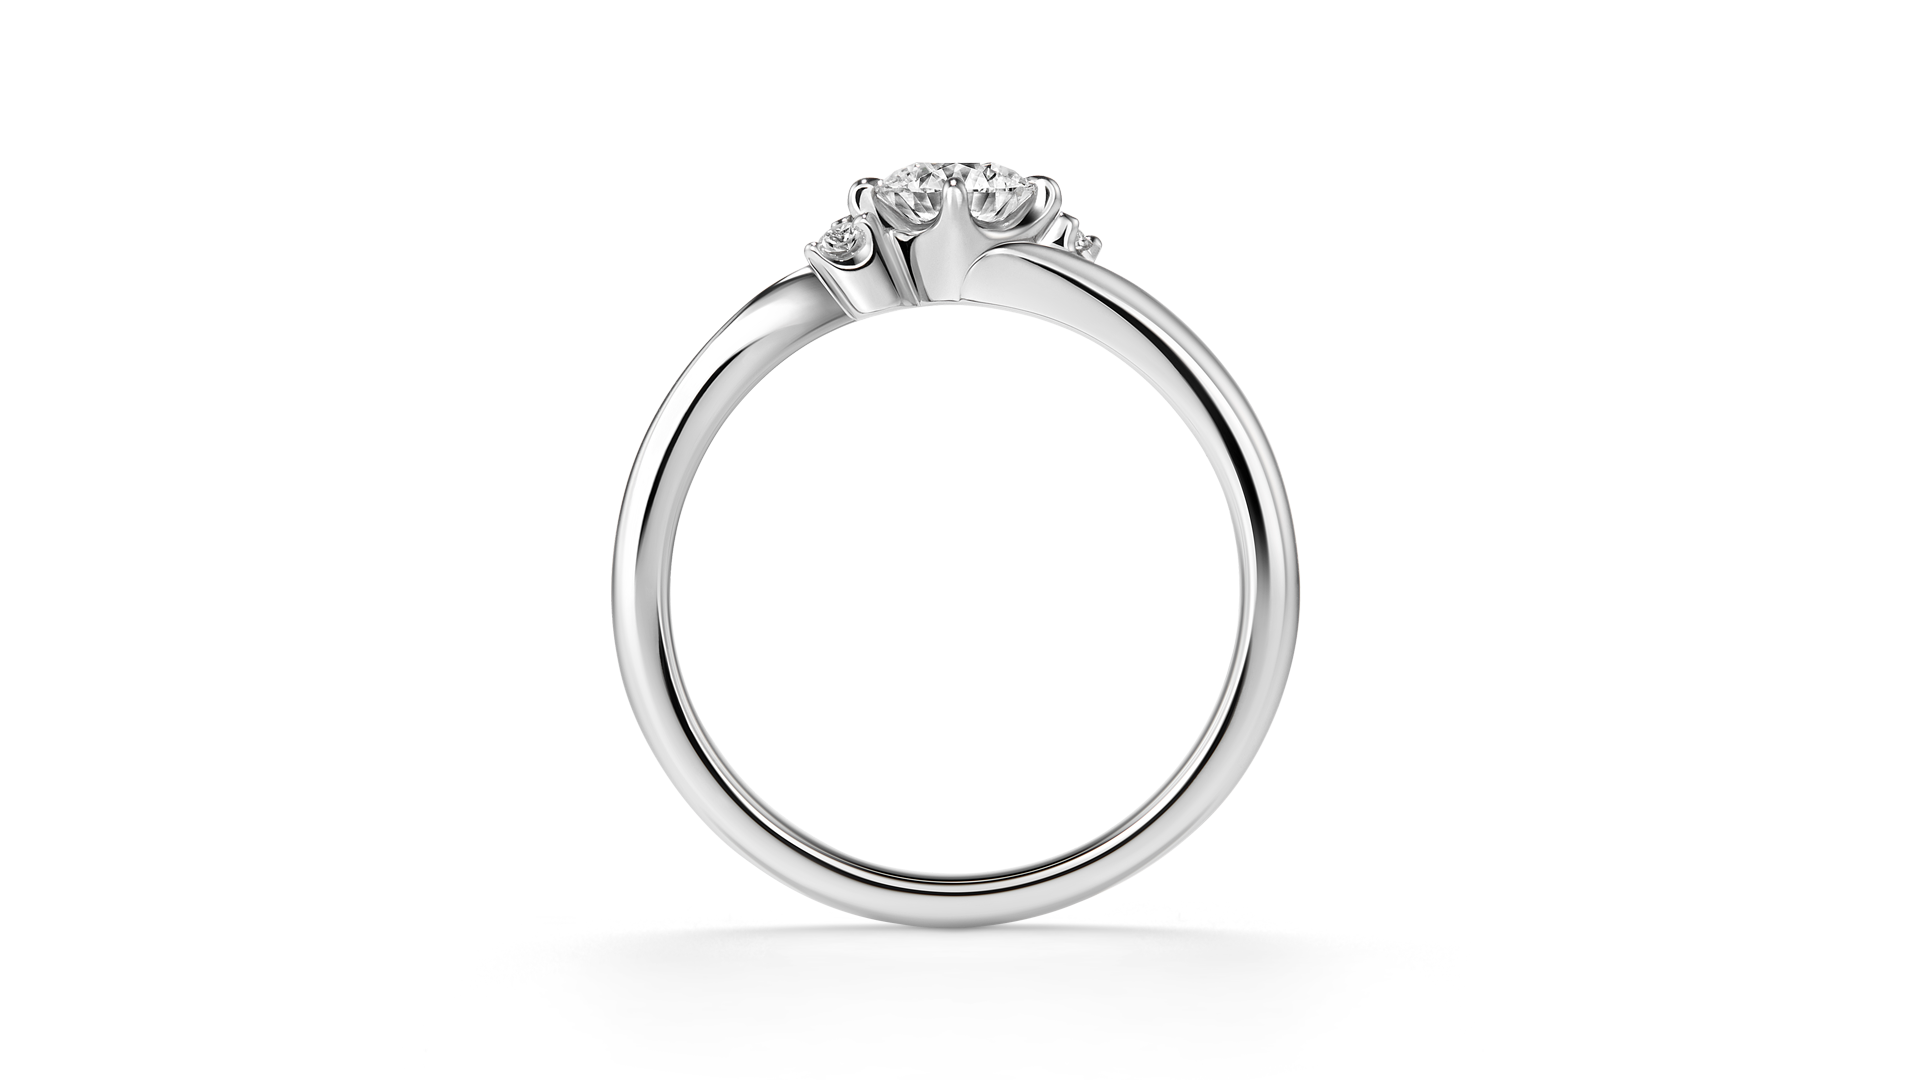 kitalpha キタルファ | 婚約指輪サムネイル 2